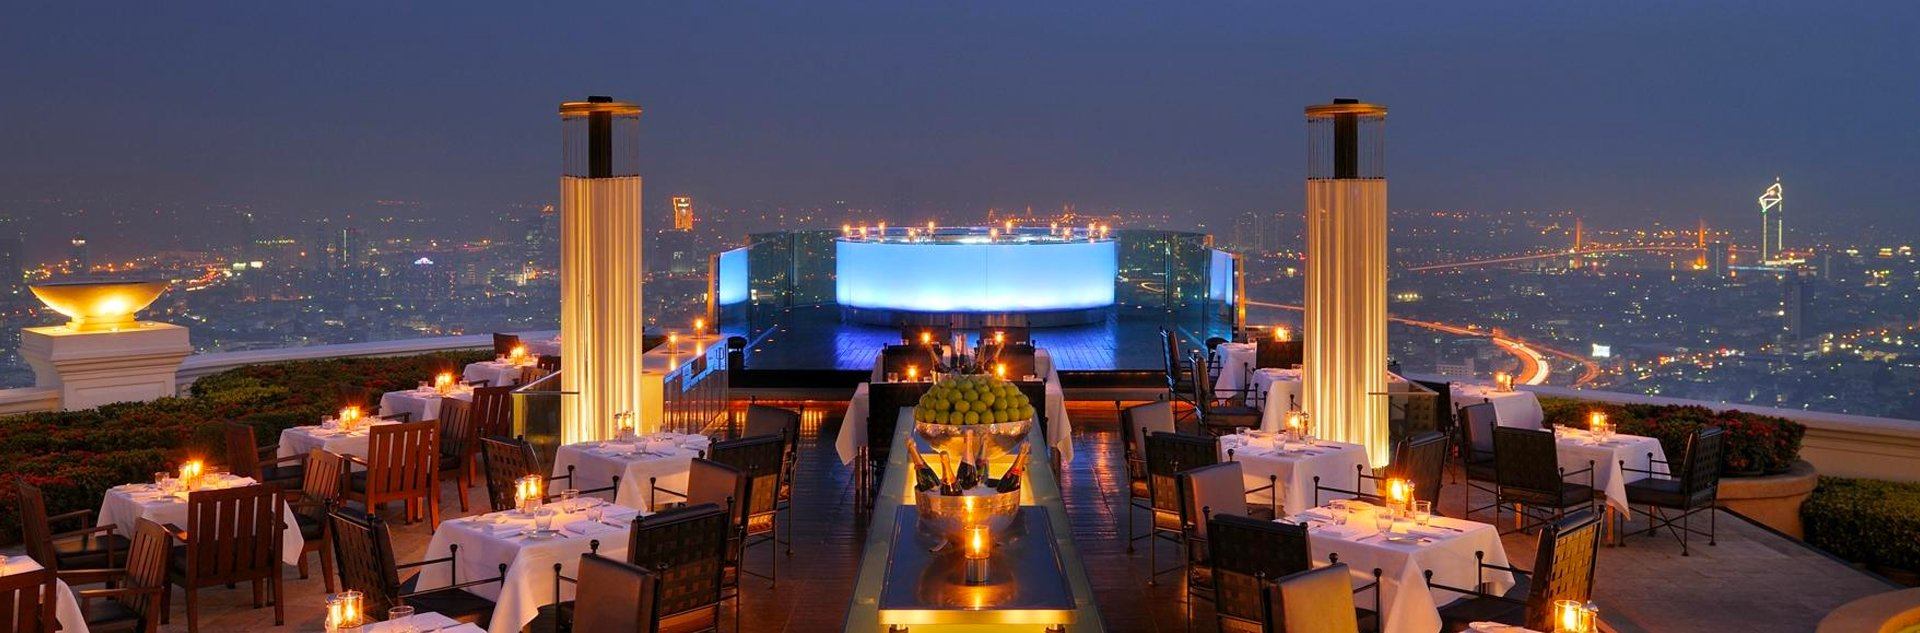 rooftop du restaurant sirocco